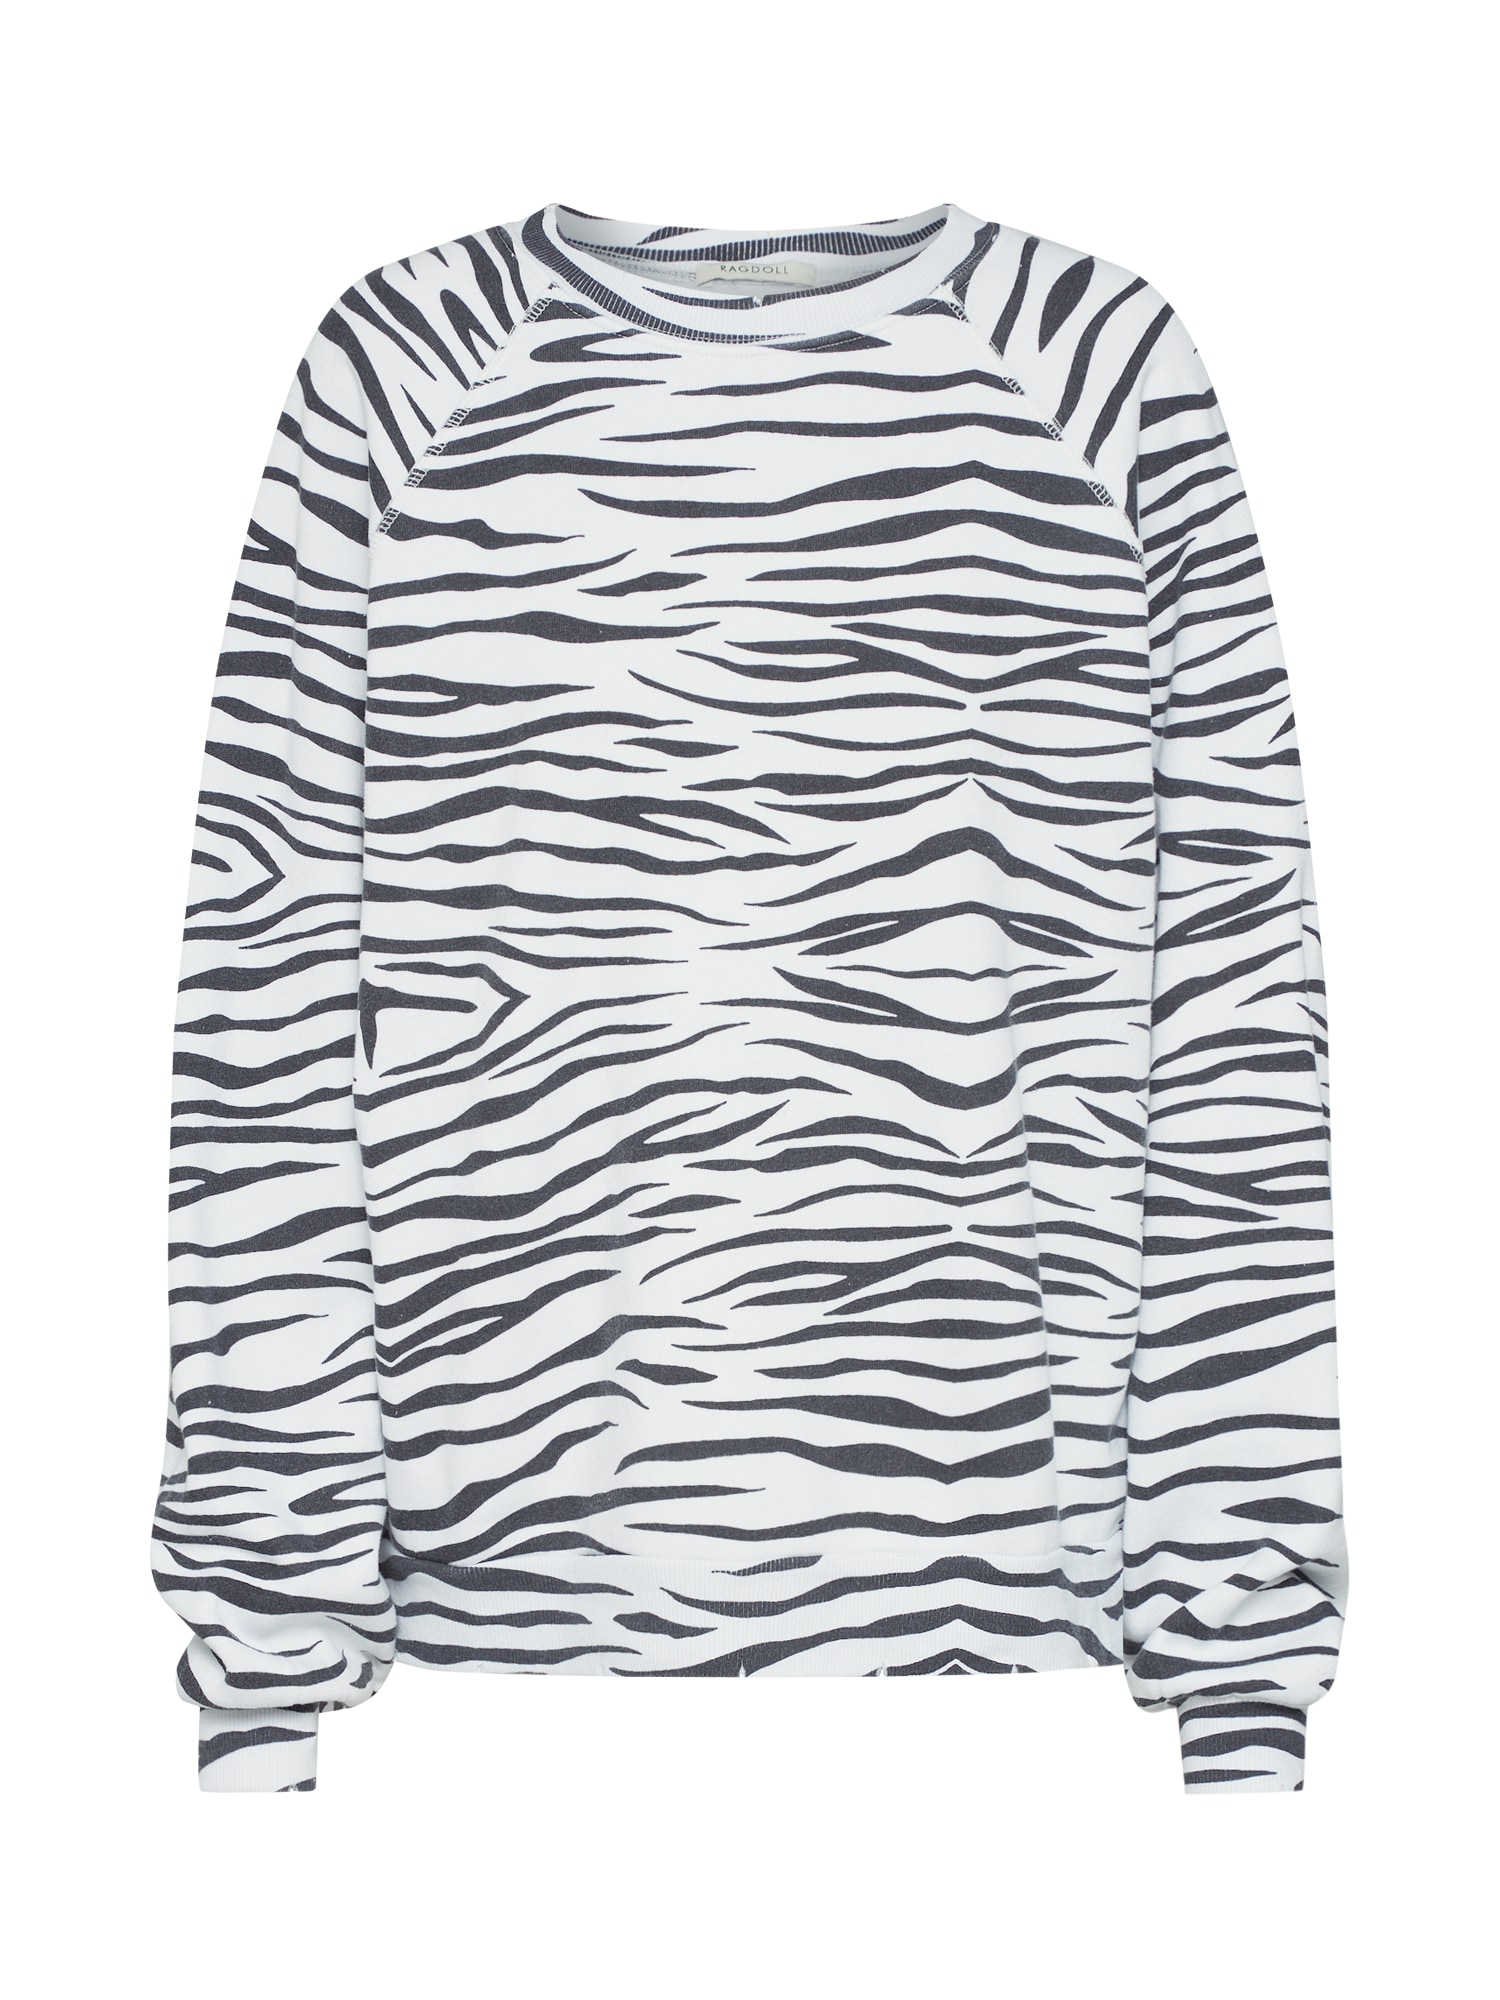 Mikina Oversized Sweatshirt černá bílá Ragdoll LA